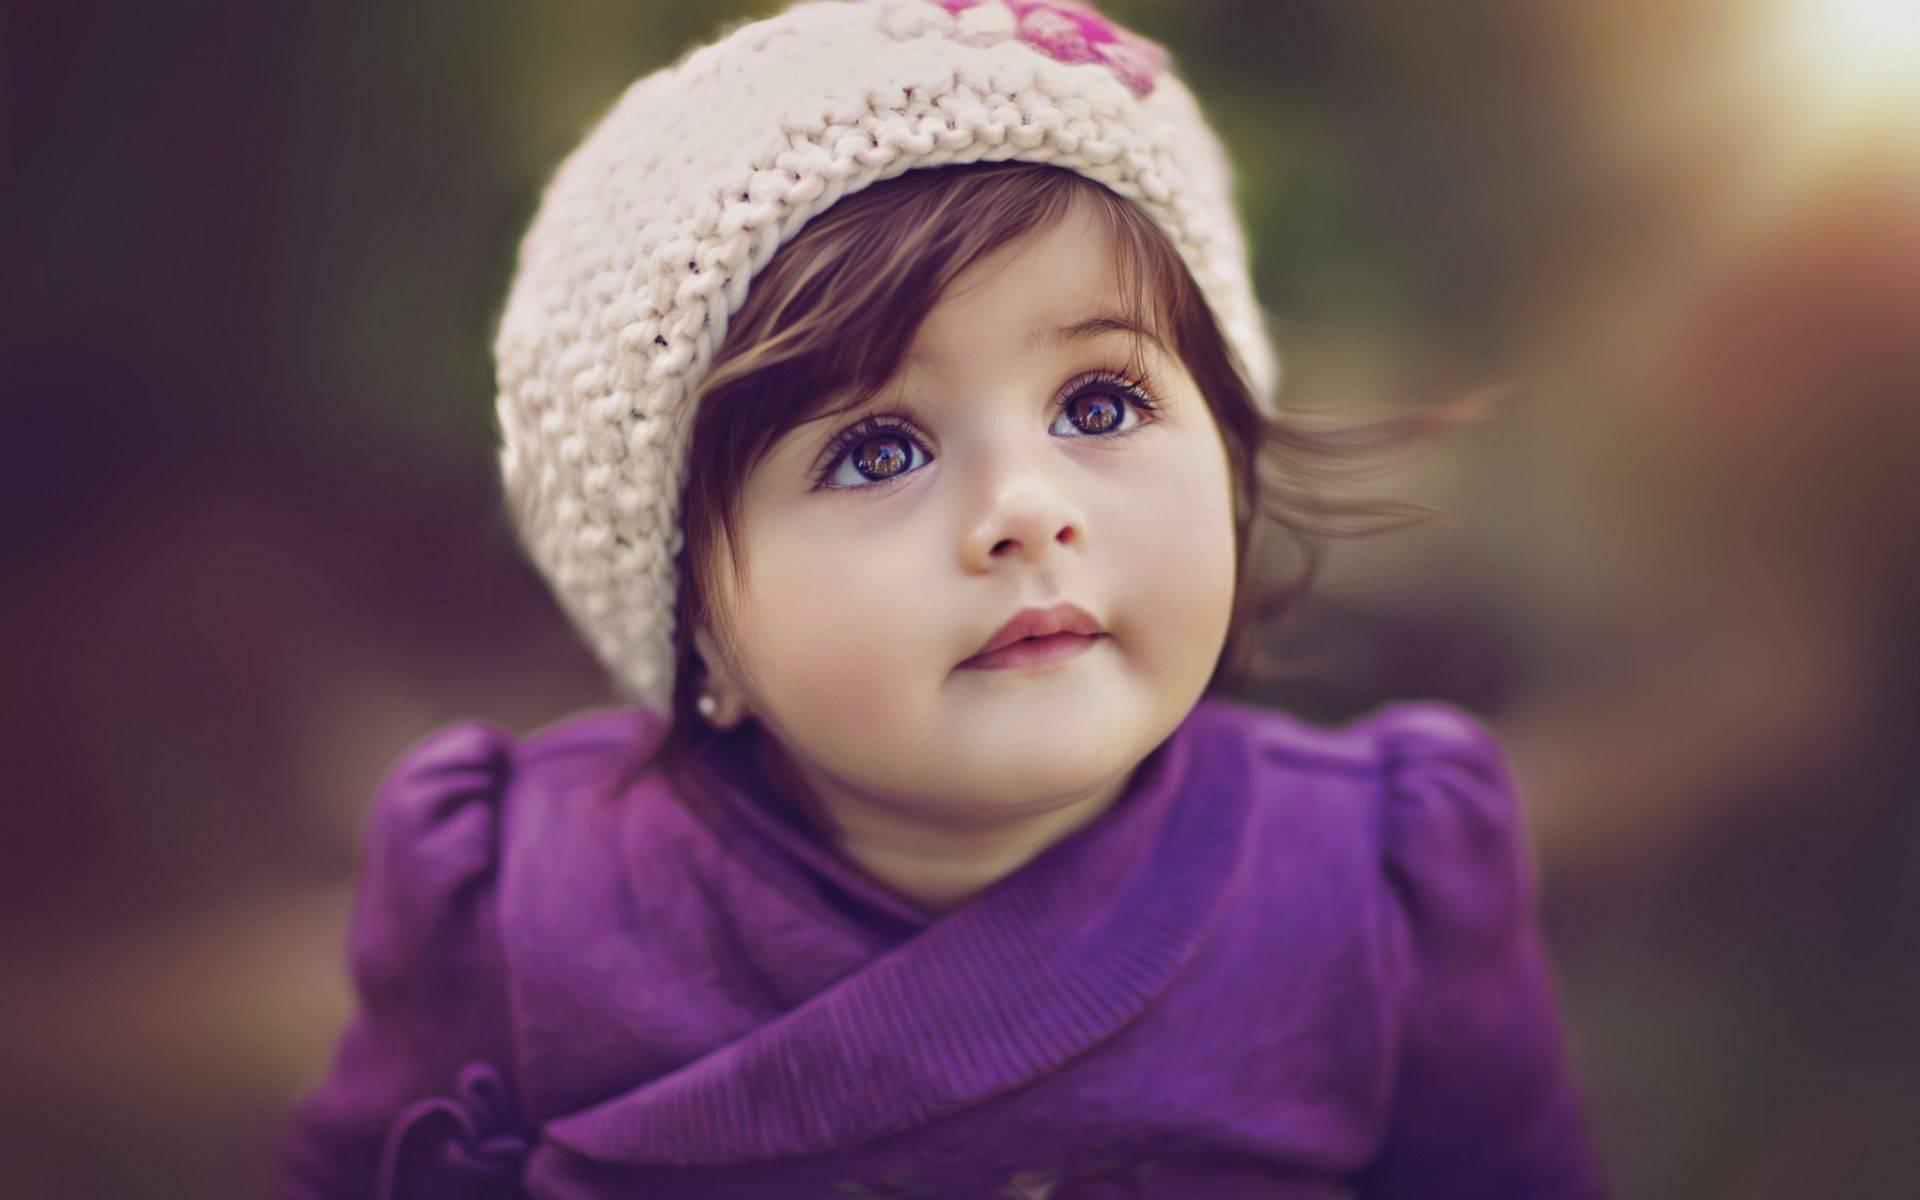 بالصور صور بنات كيوت روعه , اجمل الصور لبنات طفوليه 1076 10